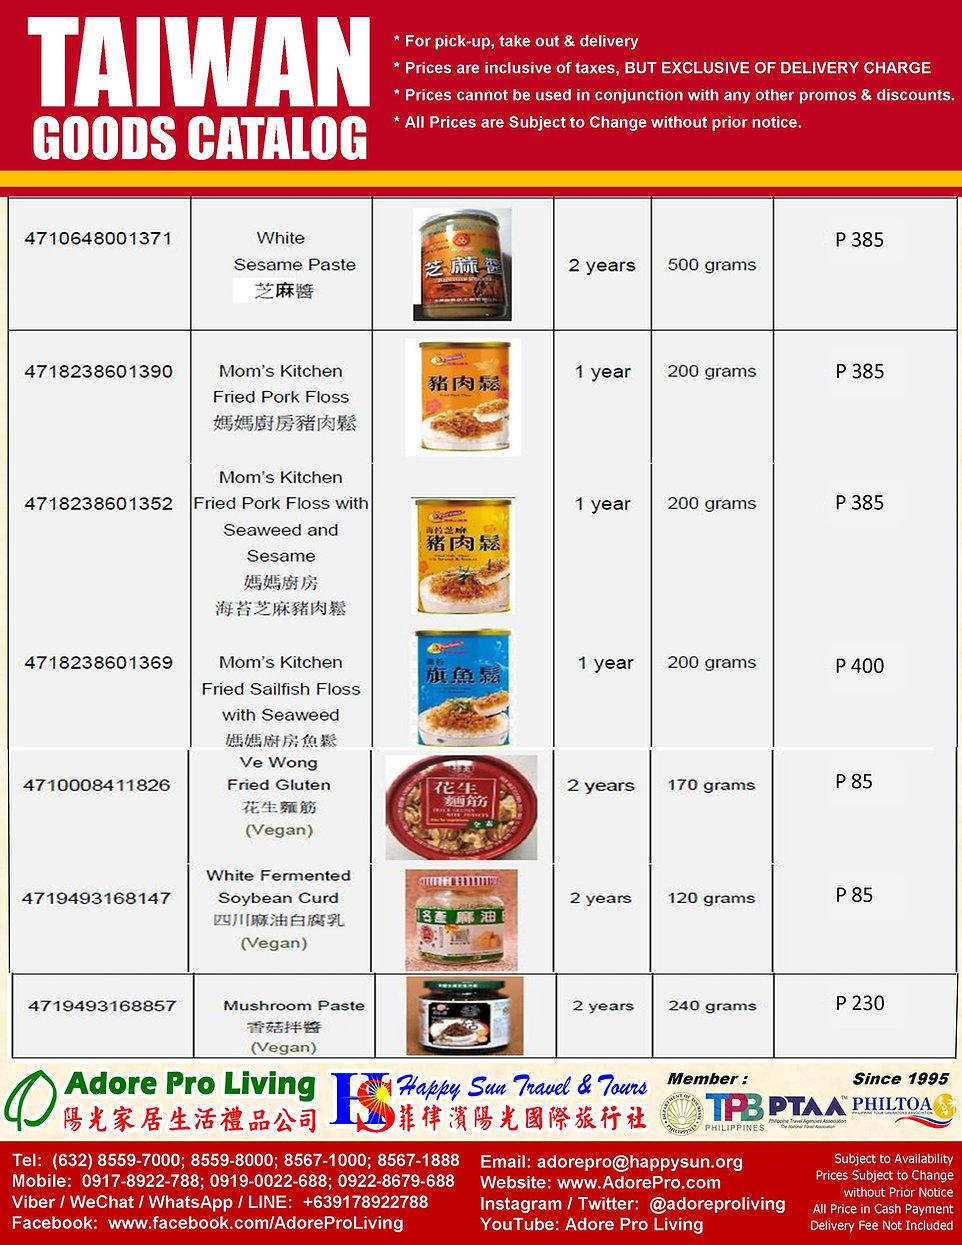 P9_Taiwan Goods Catalog_202009119.jpg